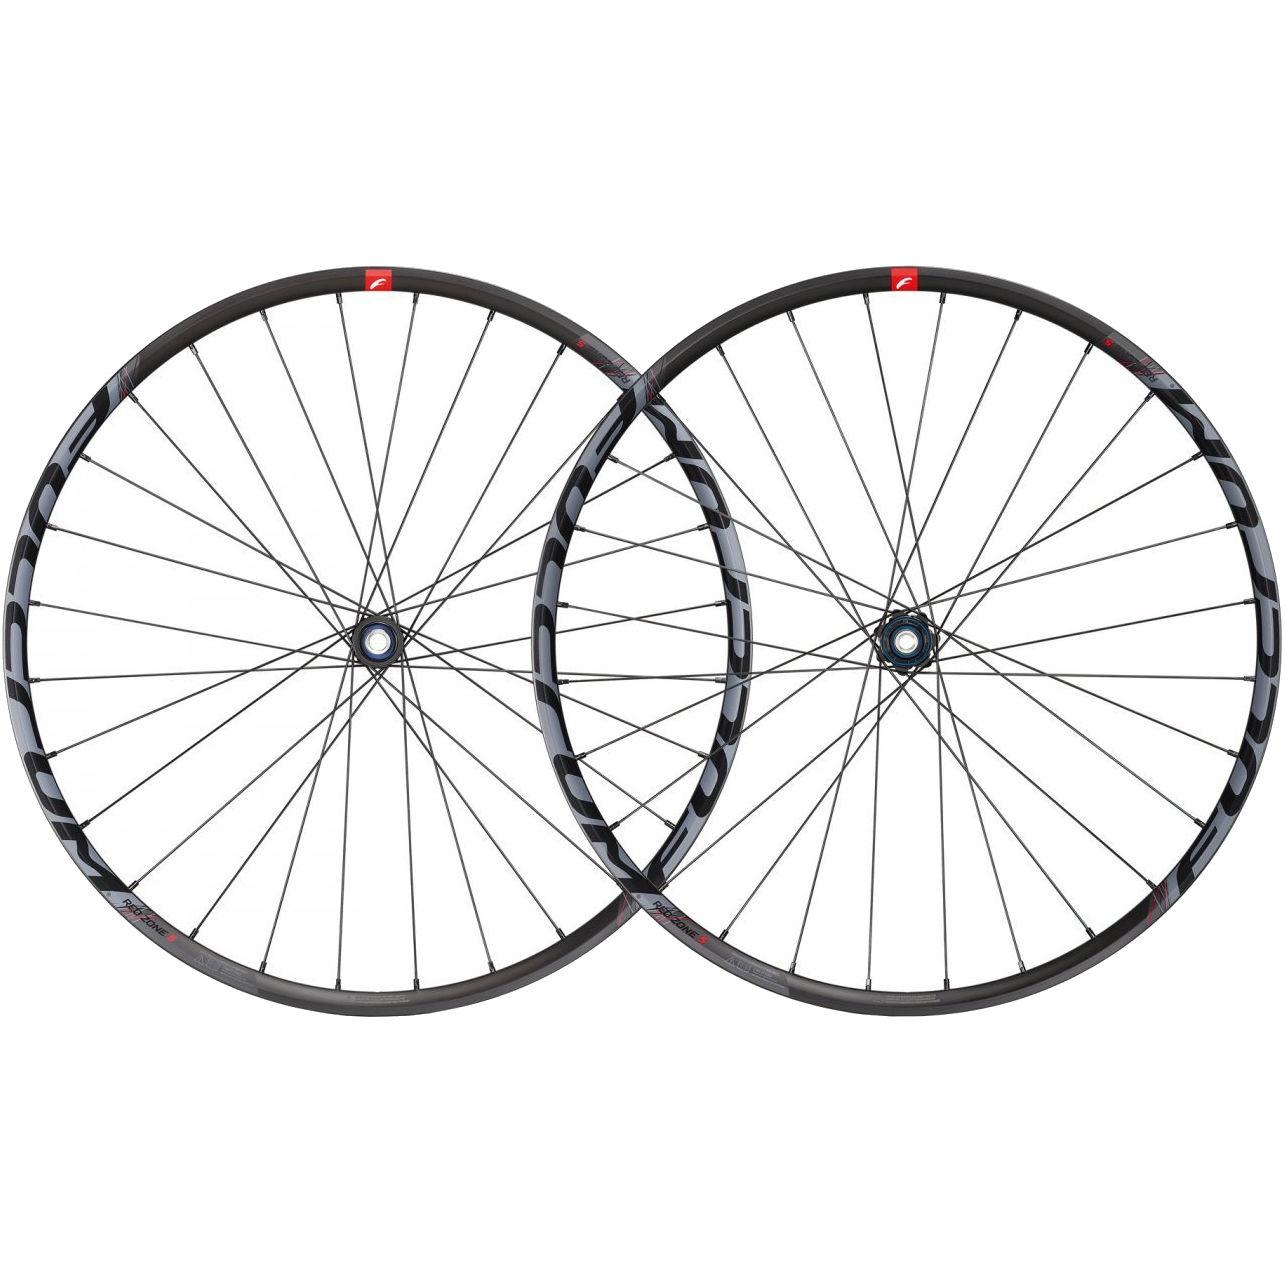 "Fulcrum Red Zone 5 MTB Wheelset - 29"""